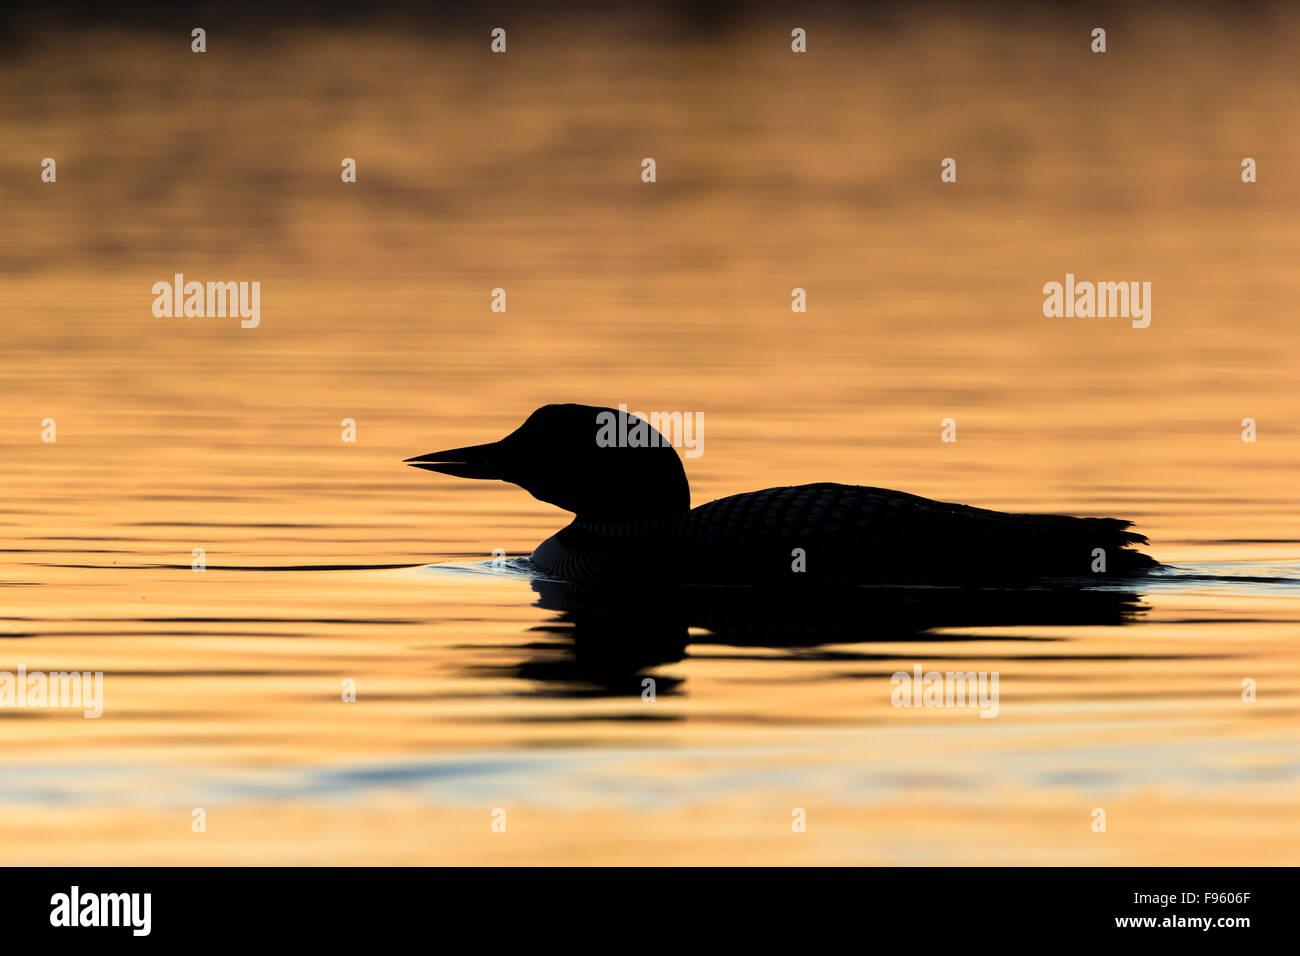 Common loon (Gavia immer), adult at sunrise, Lac Le Jeune, British Columbia. - Stock Image